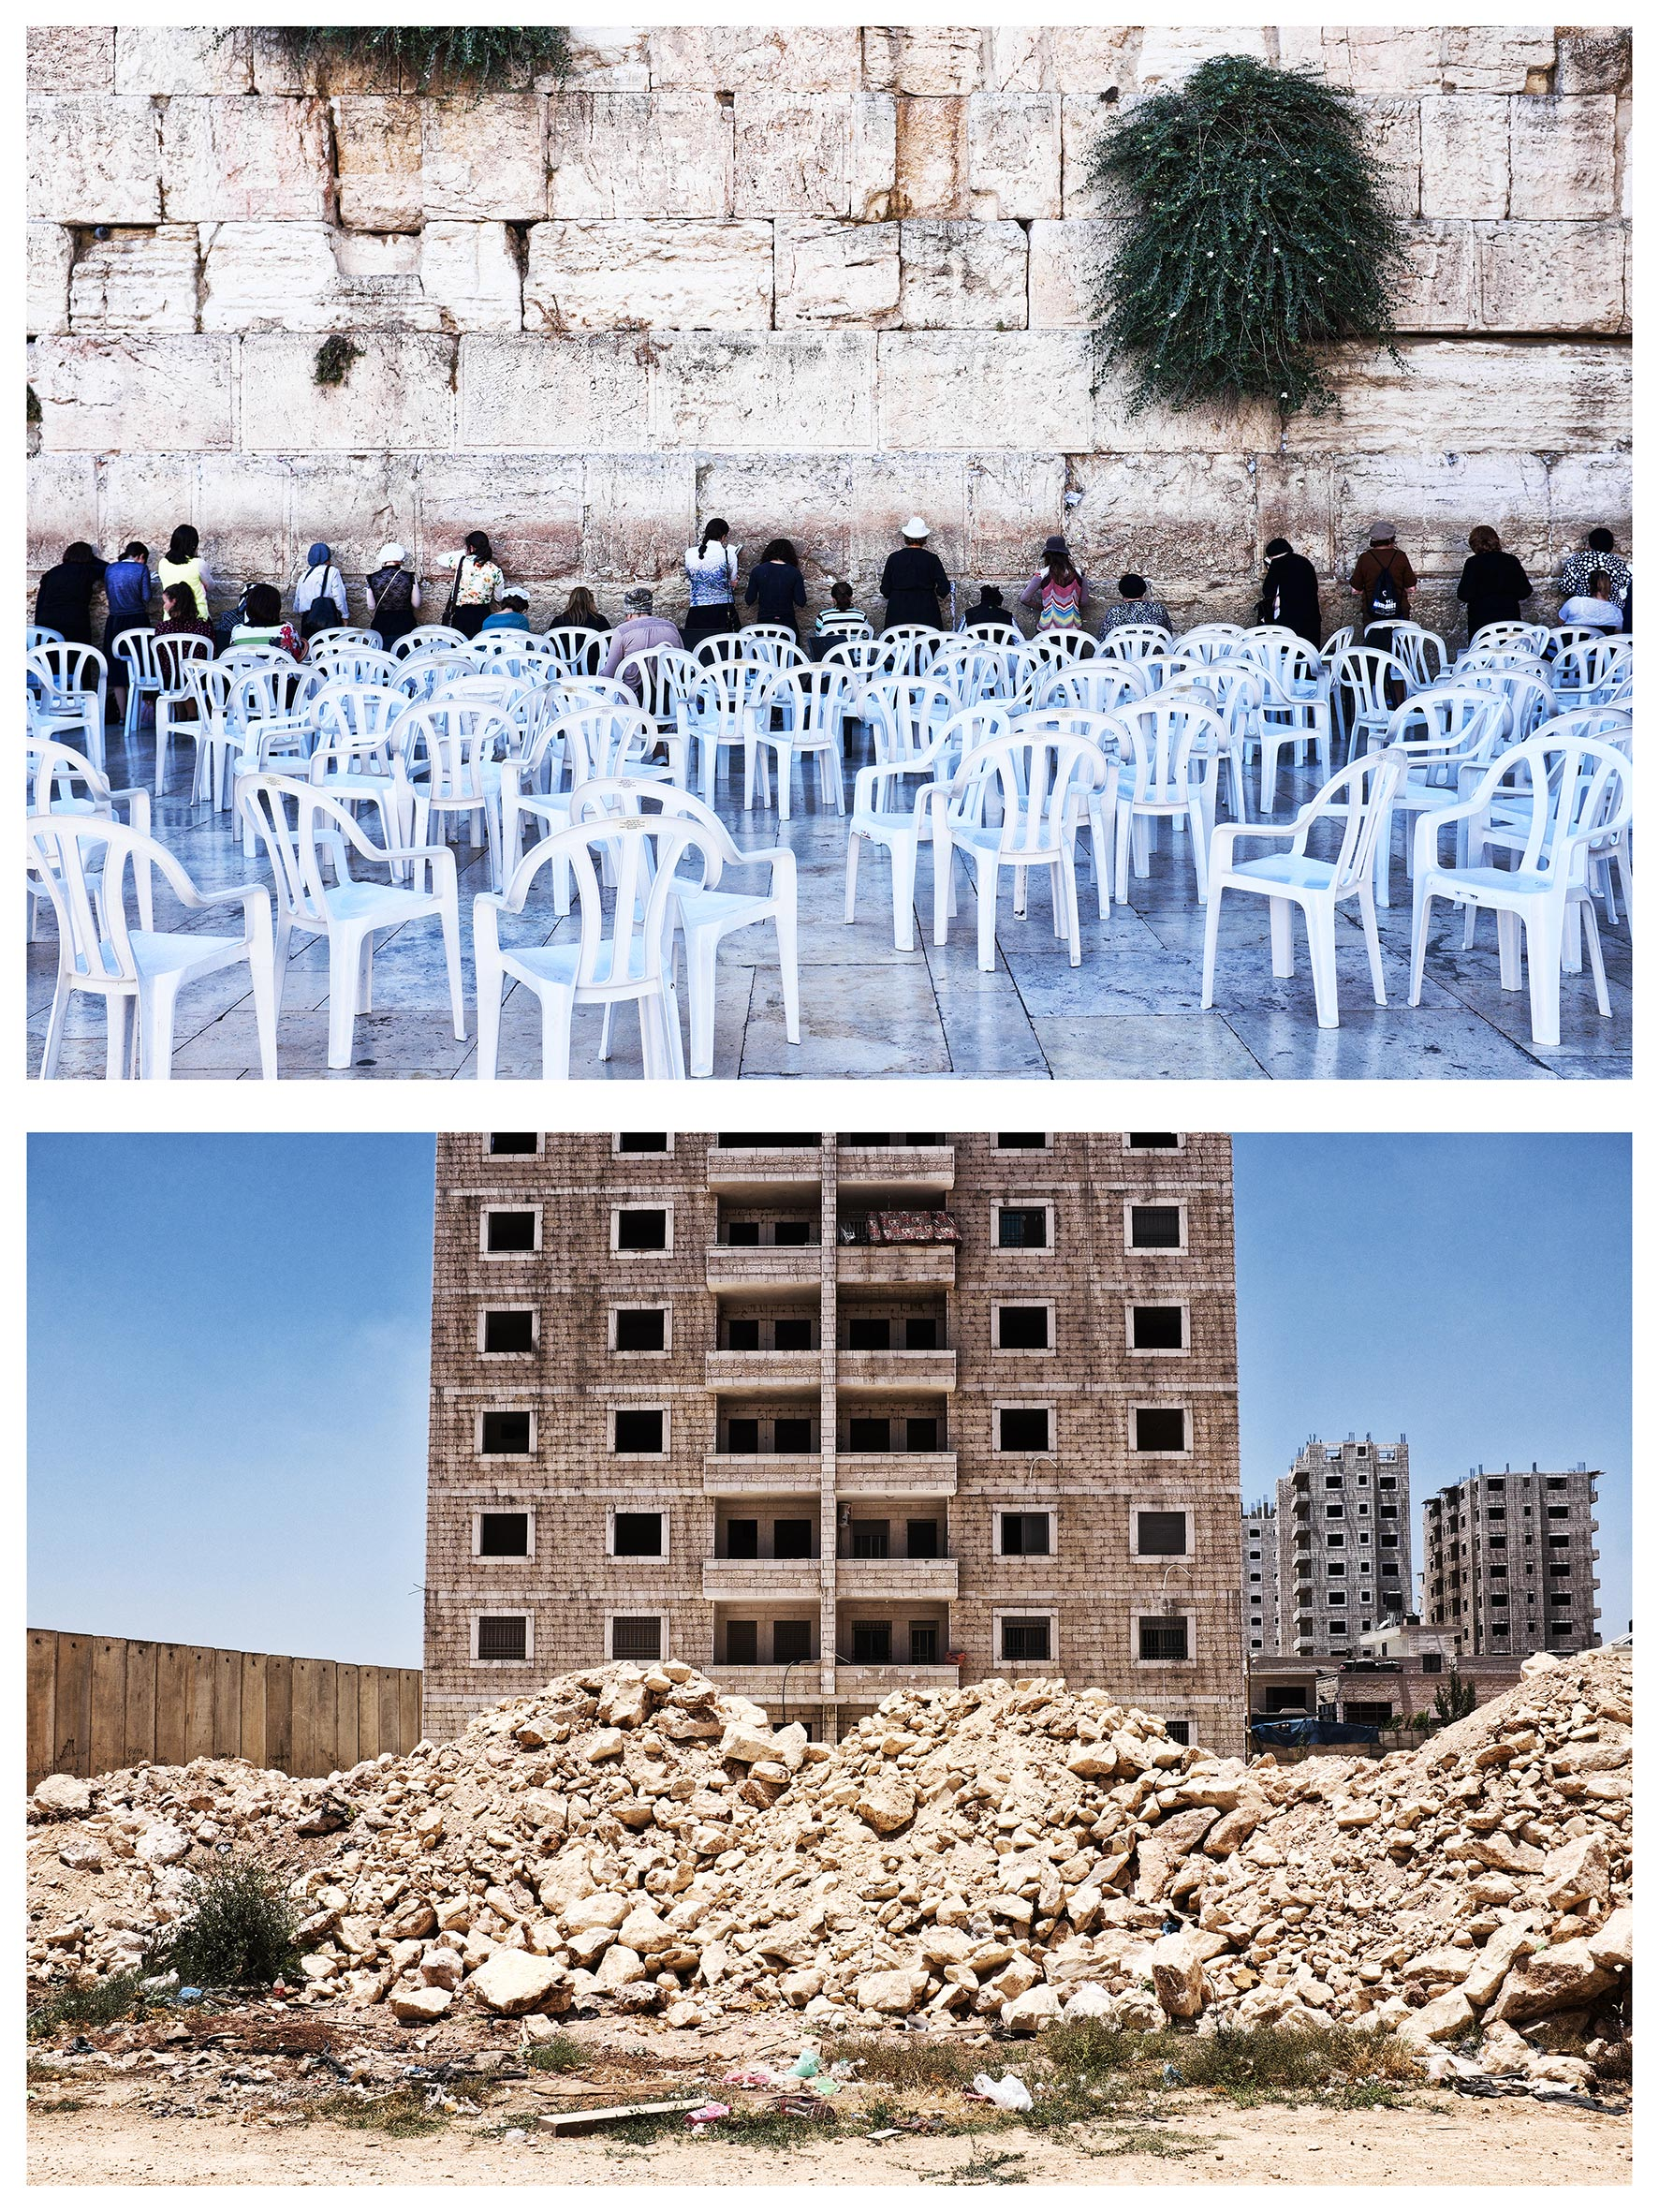 #au milieu un mur 4. Jérusalem / Ramallah